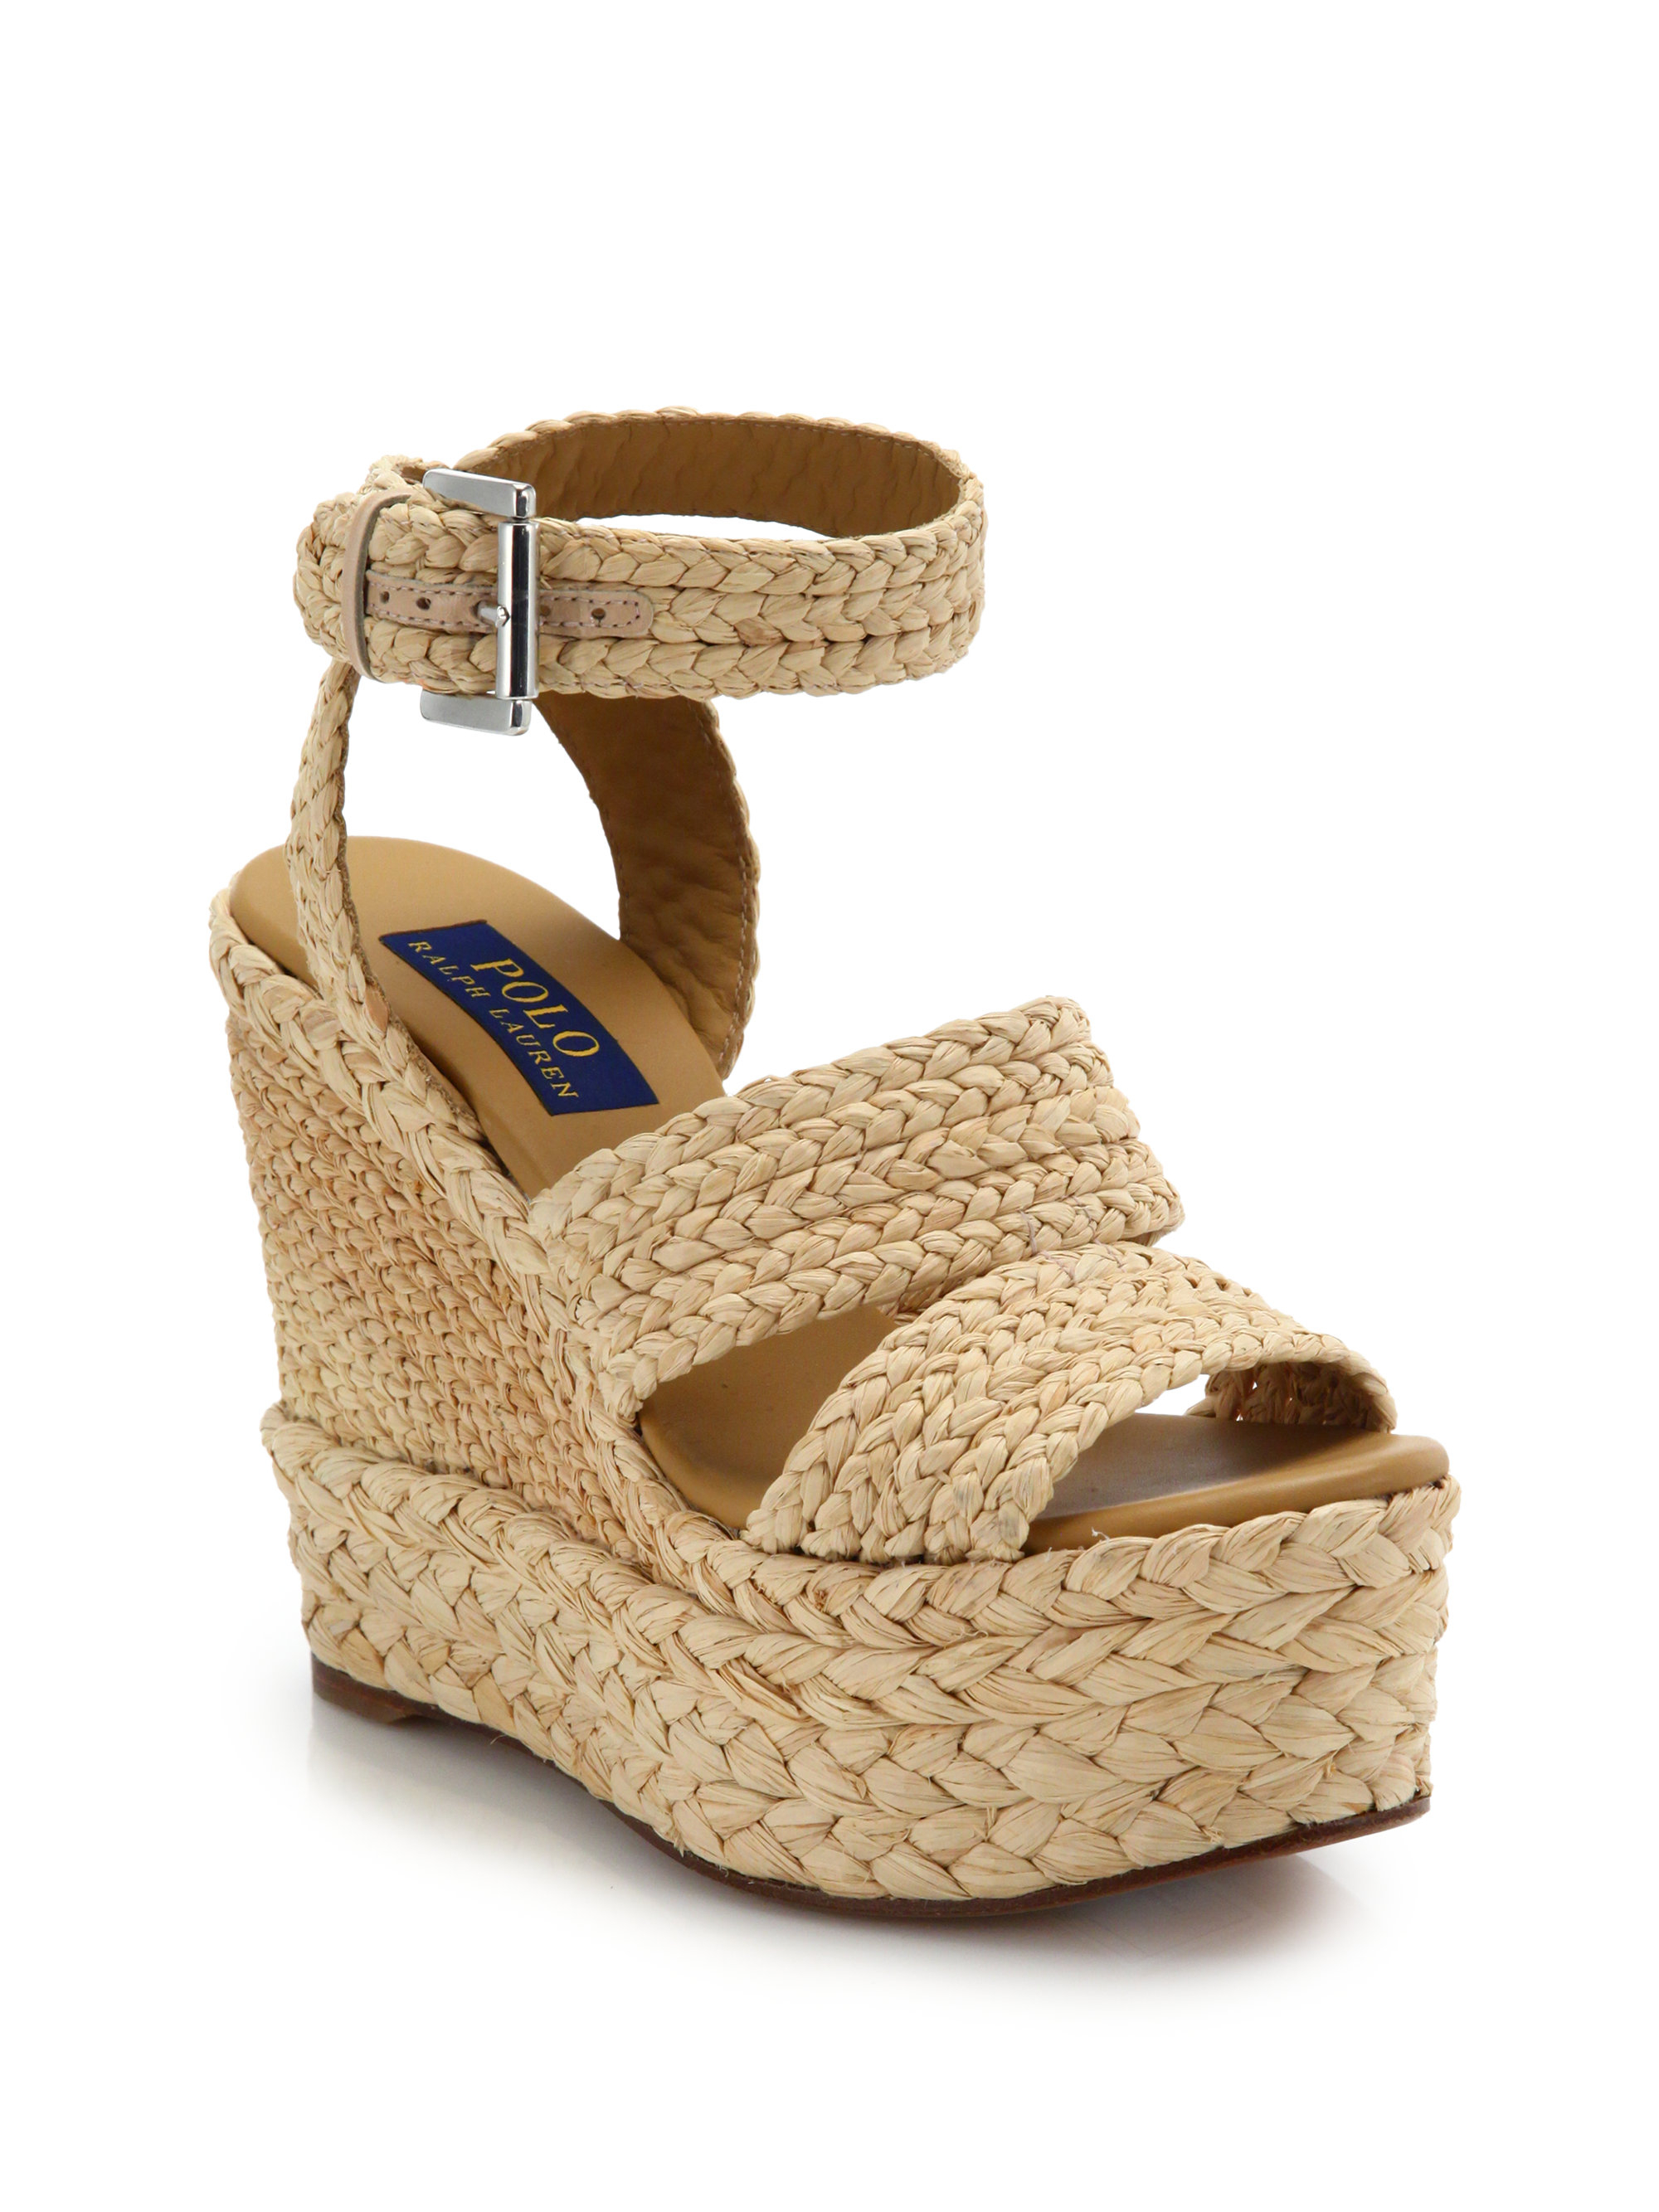 8af405d56cf1 Lyst - Polo Ralph Lauren Ethel Raffia Wedge Sandals in Natural